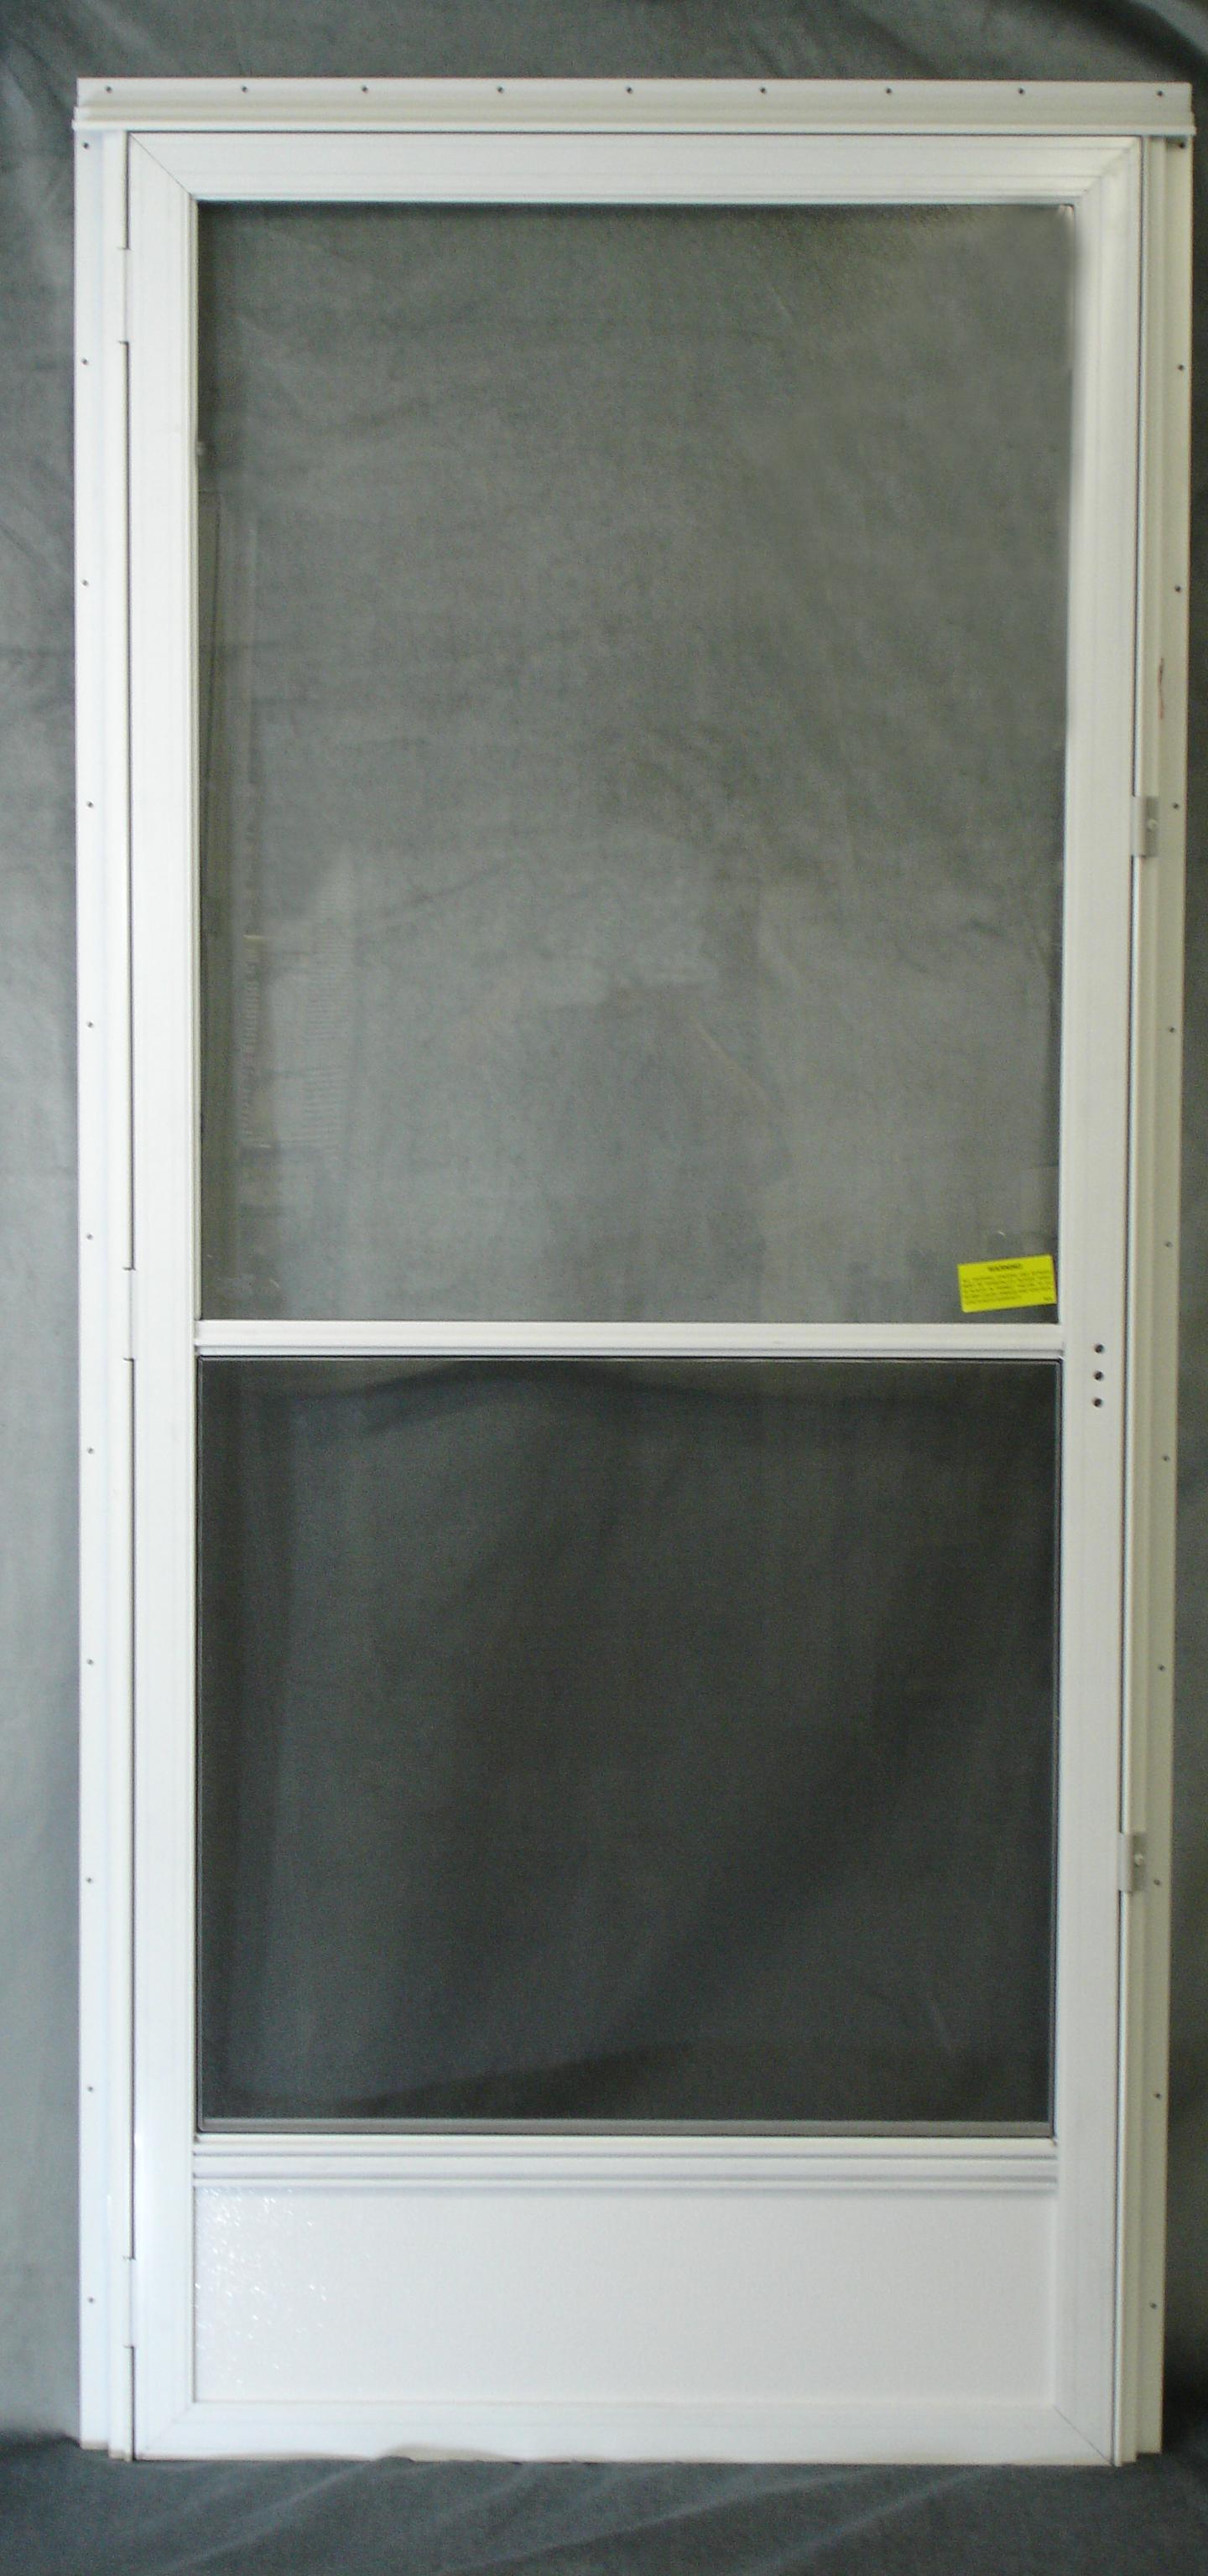 Storm Door Less Hdw Royal Durham Supply